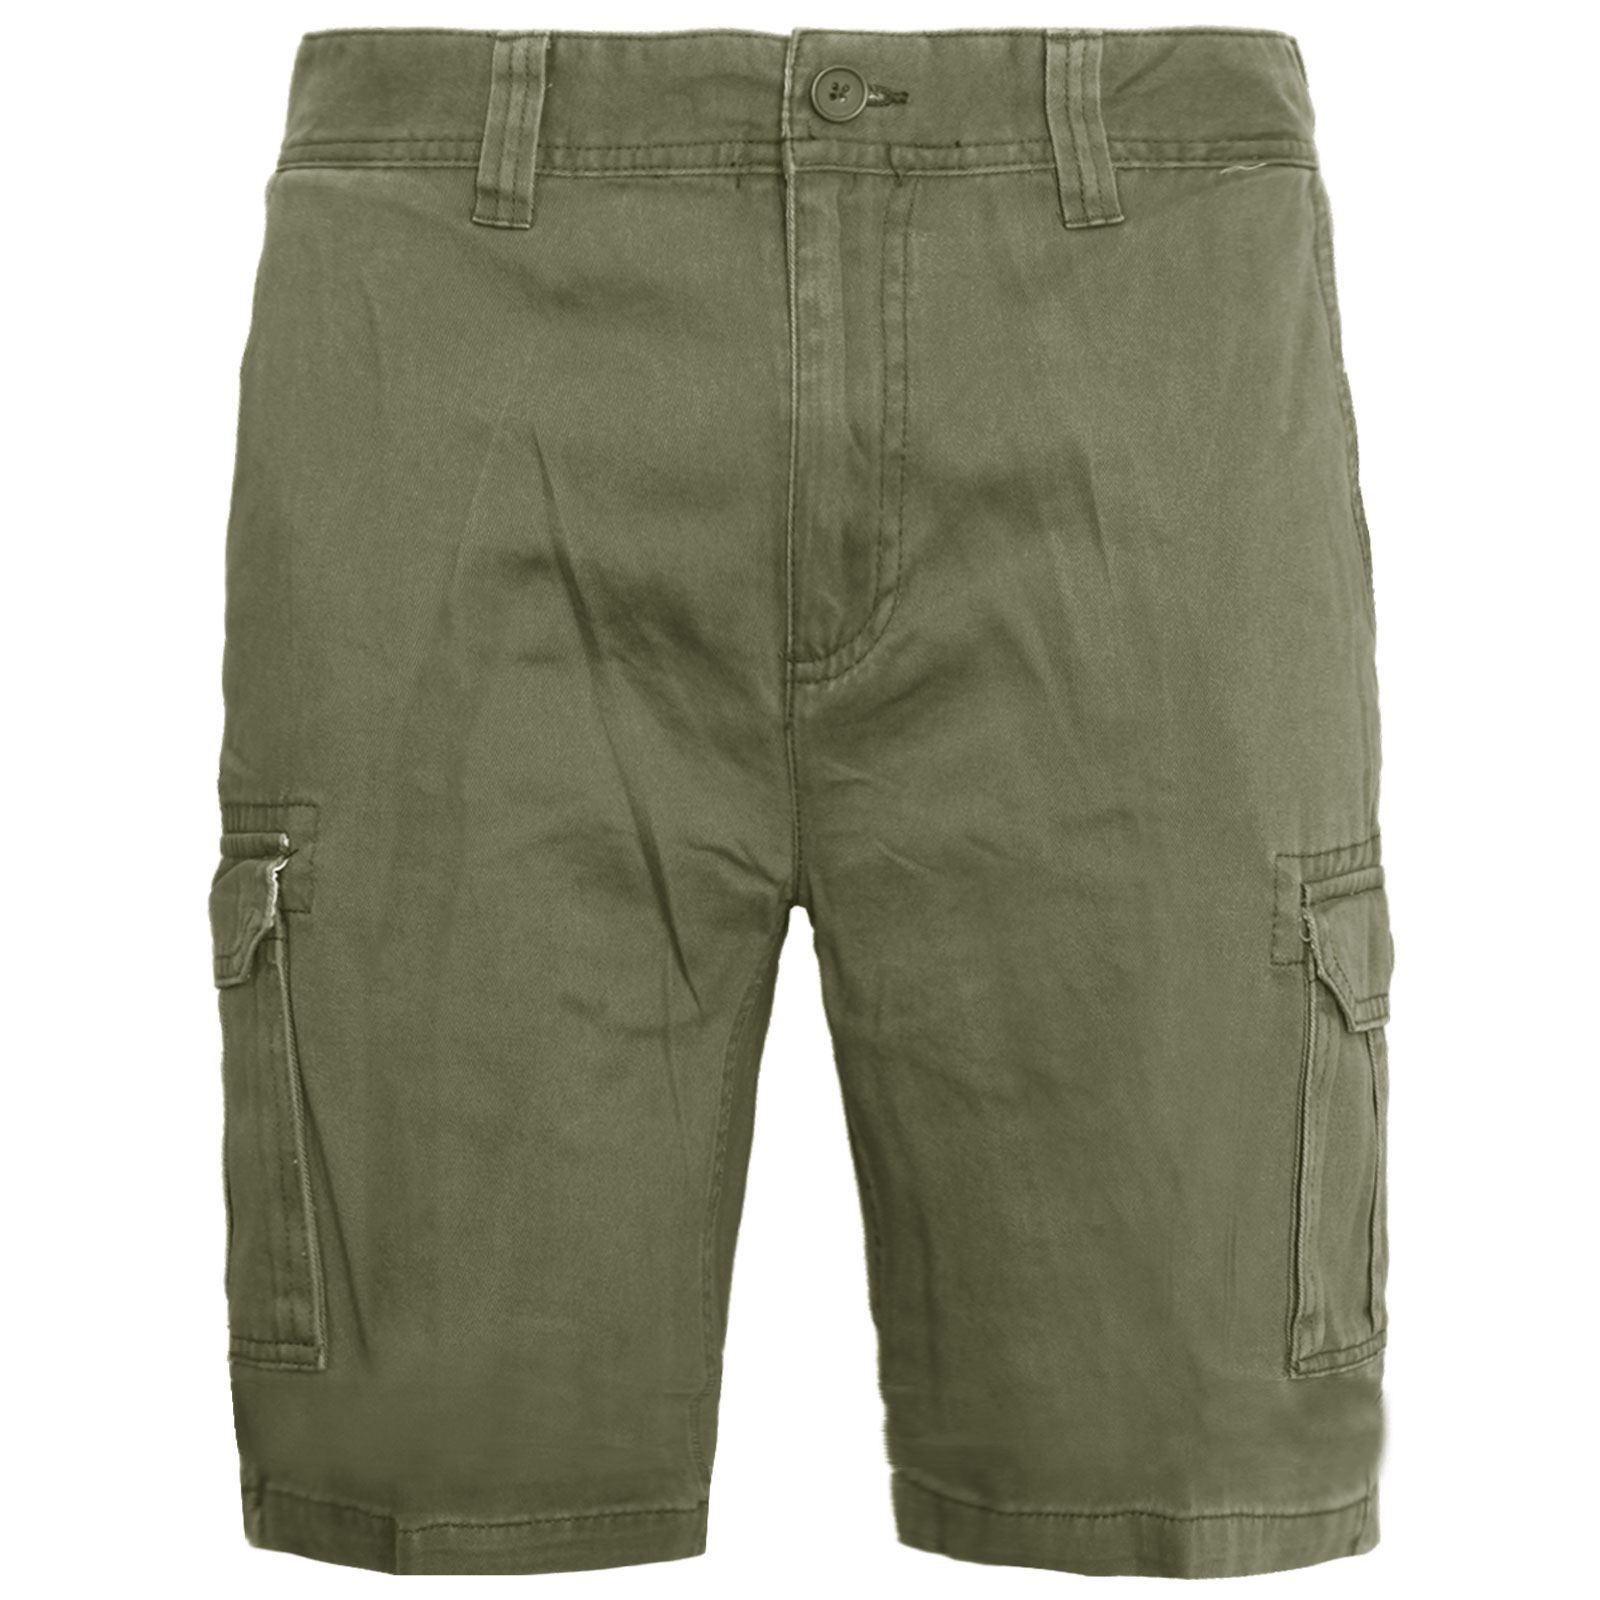 Mens-Multi-Pocket-Cargo-Shorts-Combat-Chino-Half-Pants-100-Cotton-Work-30-46 thumbnail 11